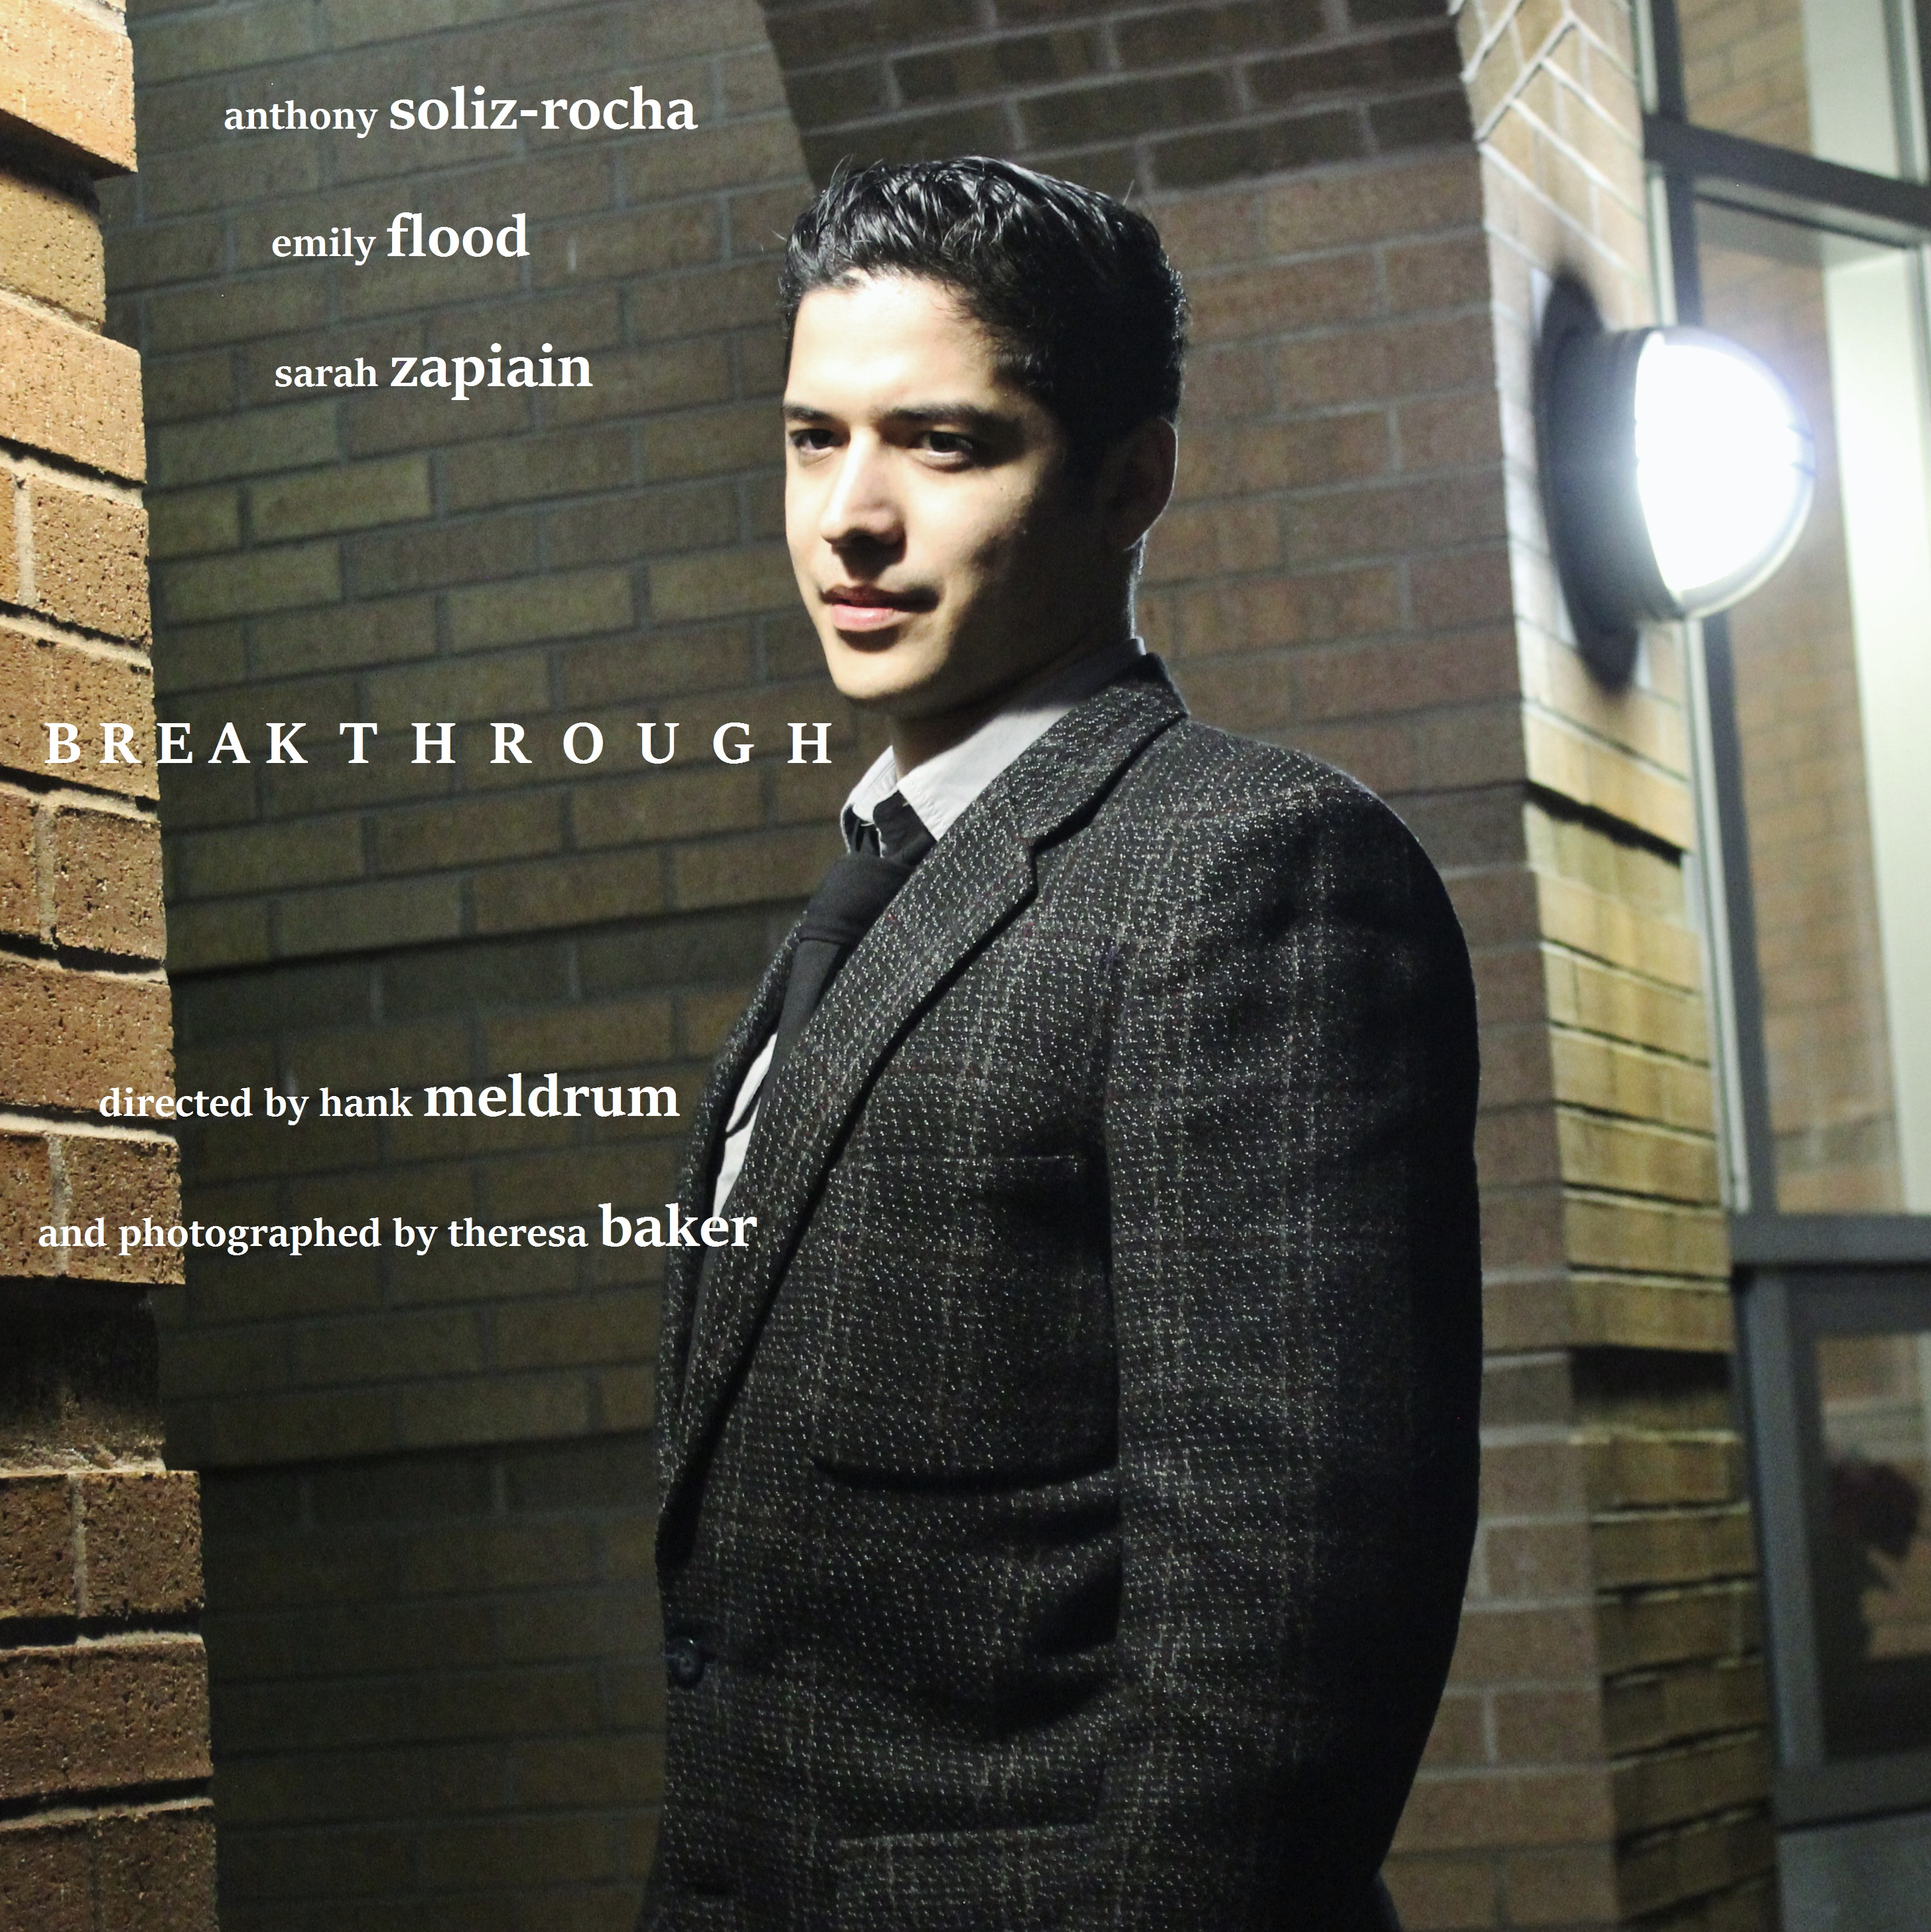 Anthony Soliz-Rocha in Breakthrough (2017)